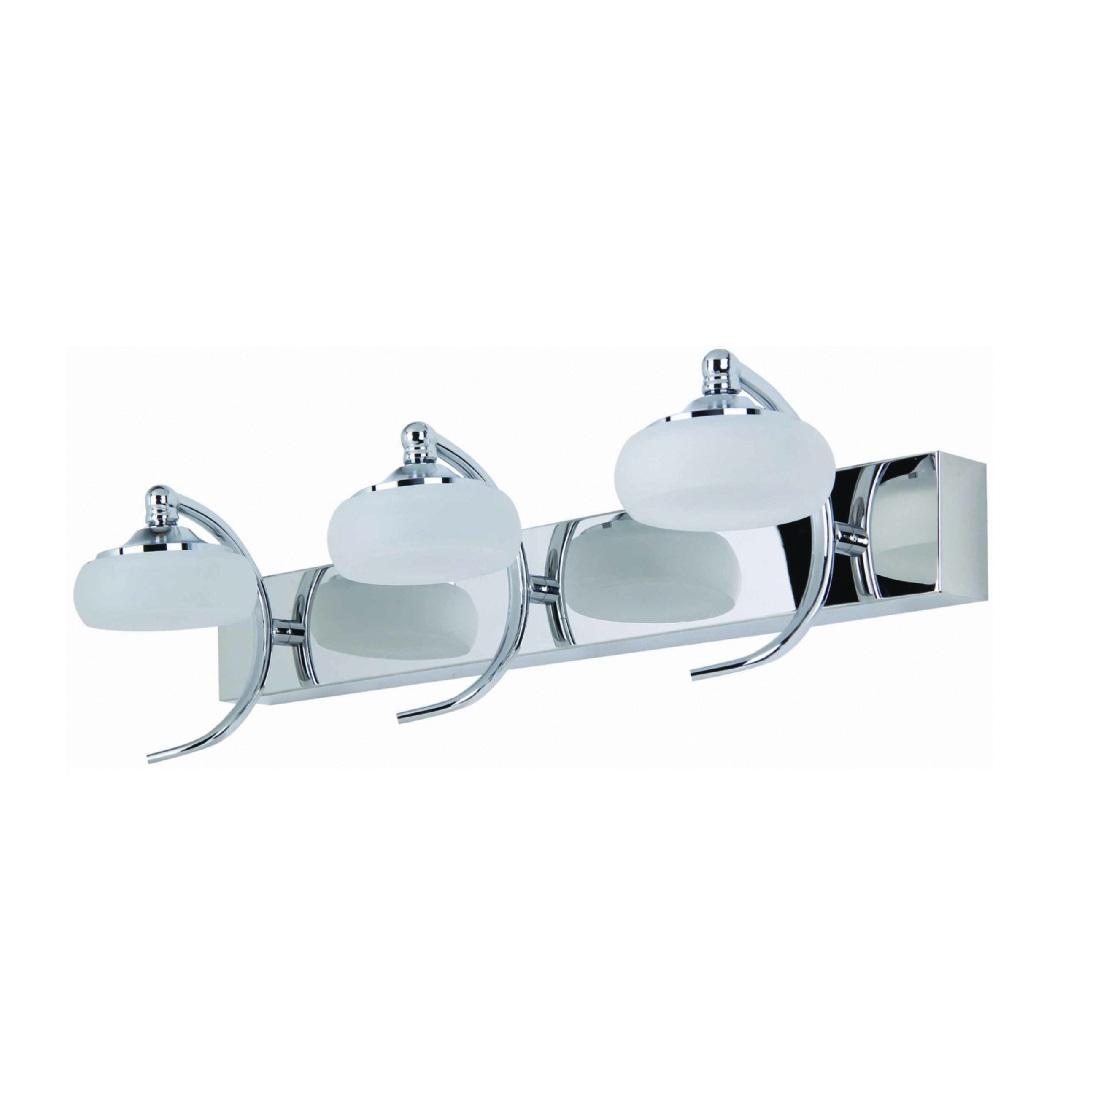 K2 GLOBAL KSL183 - Dekoratif LED Aplik